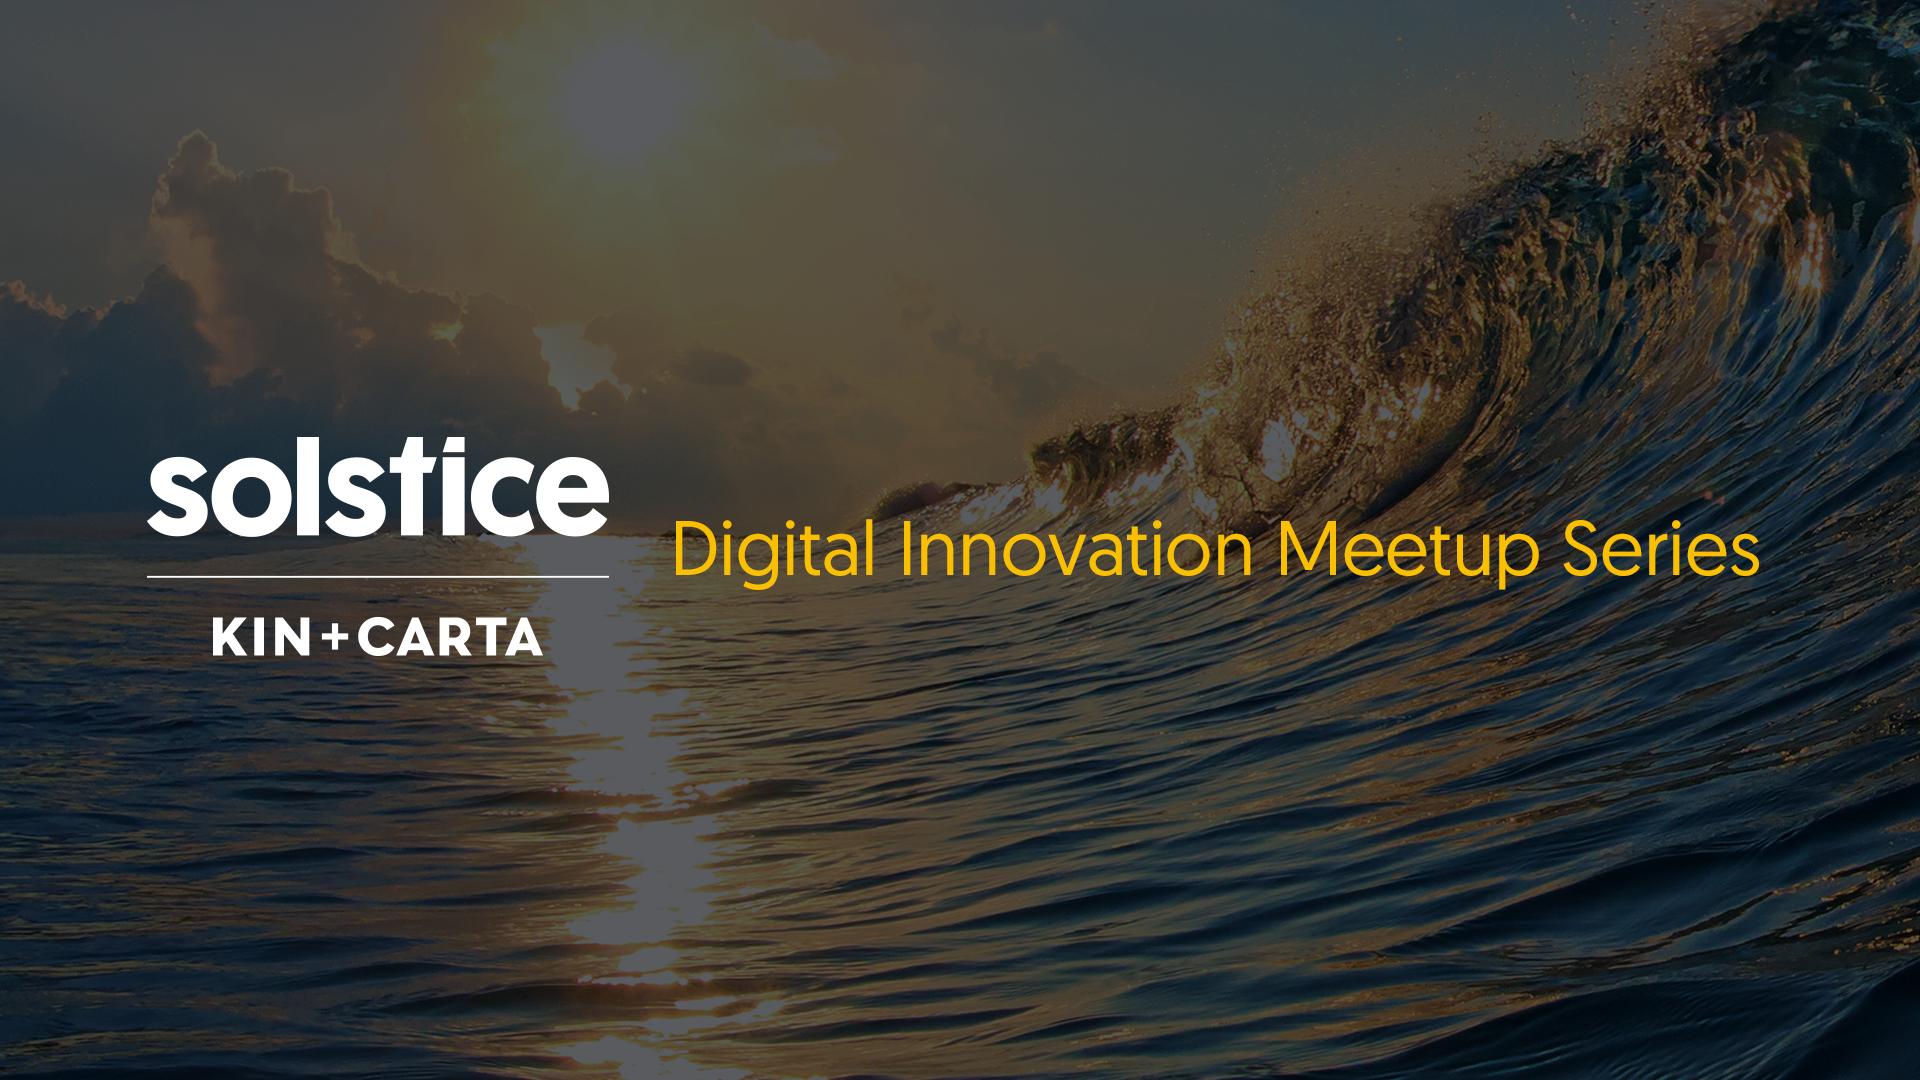 The Solstice Digital Innovation Meetup Series